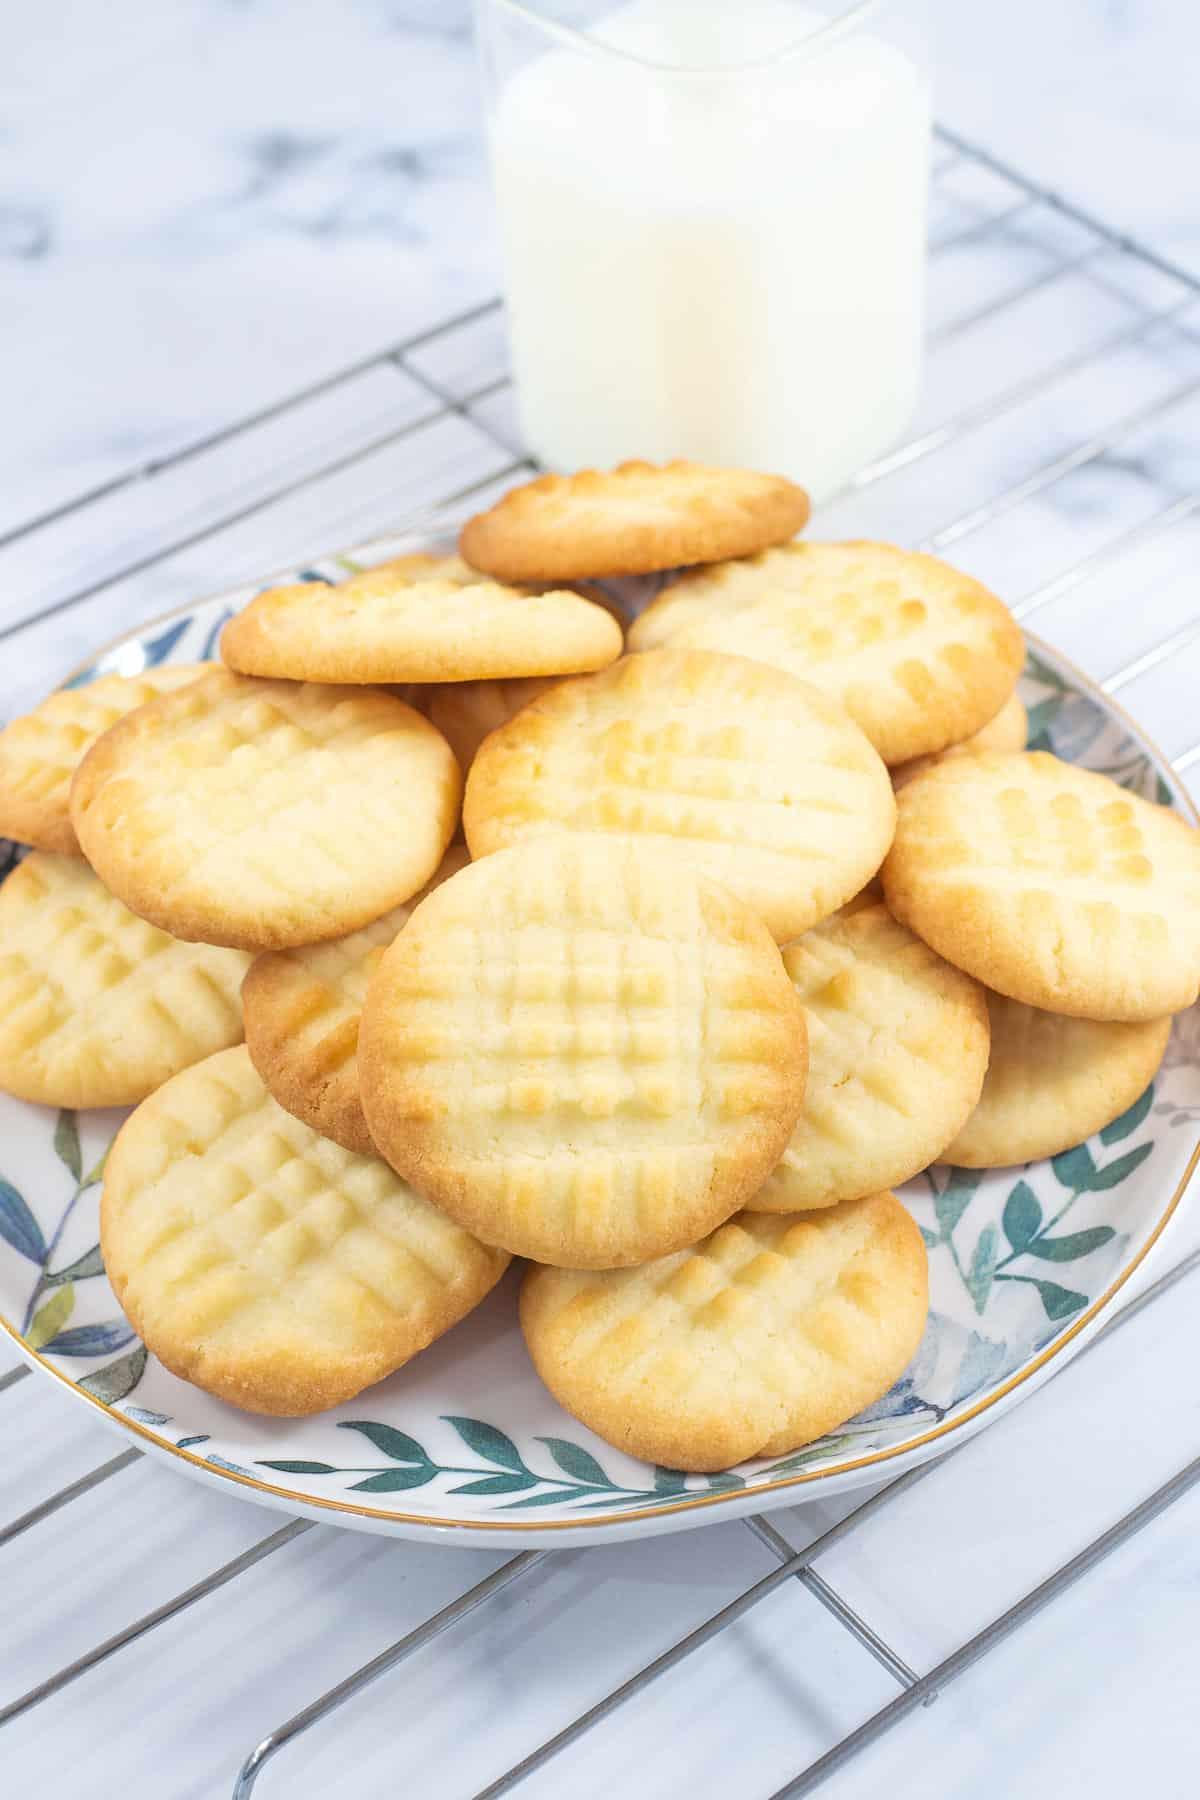 A plate of plain 3 ingredient cookies